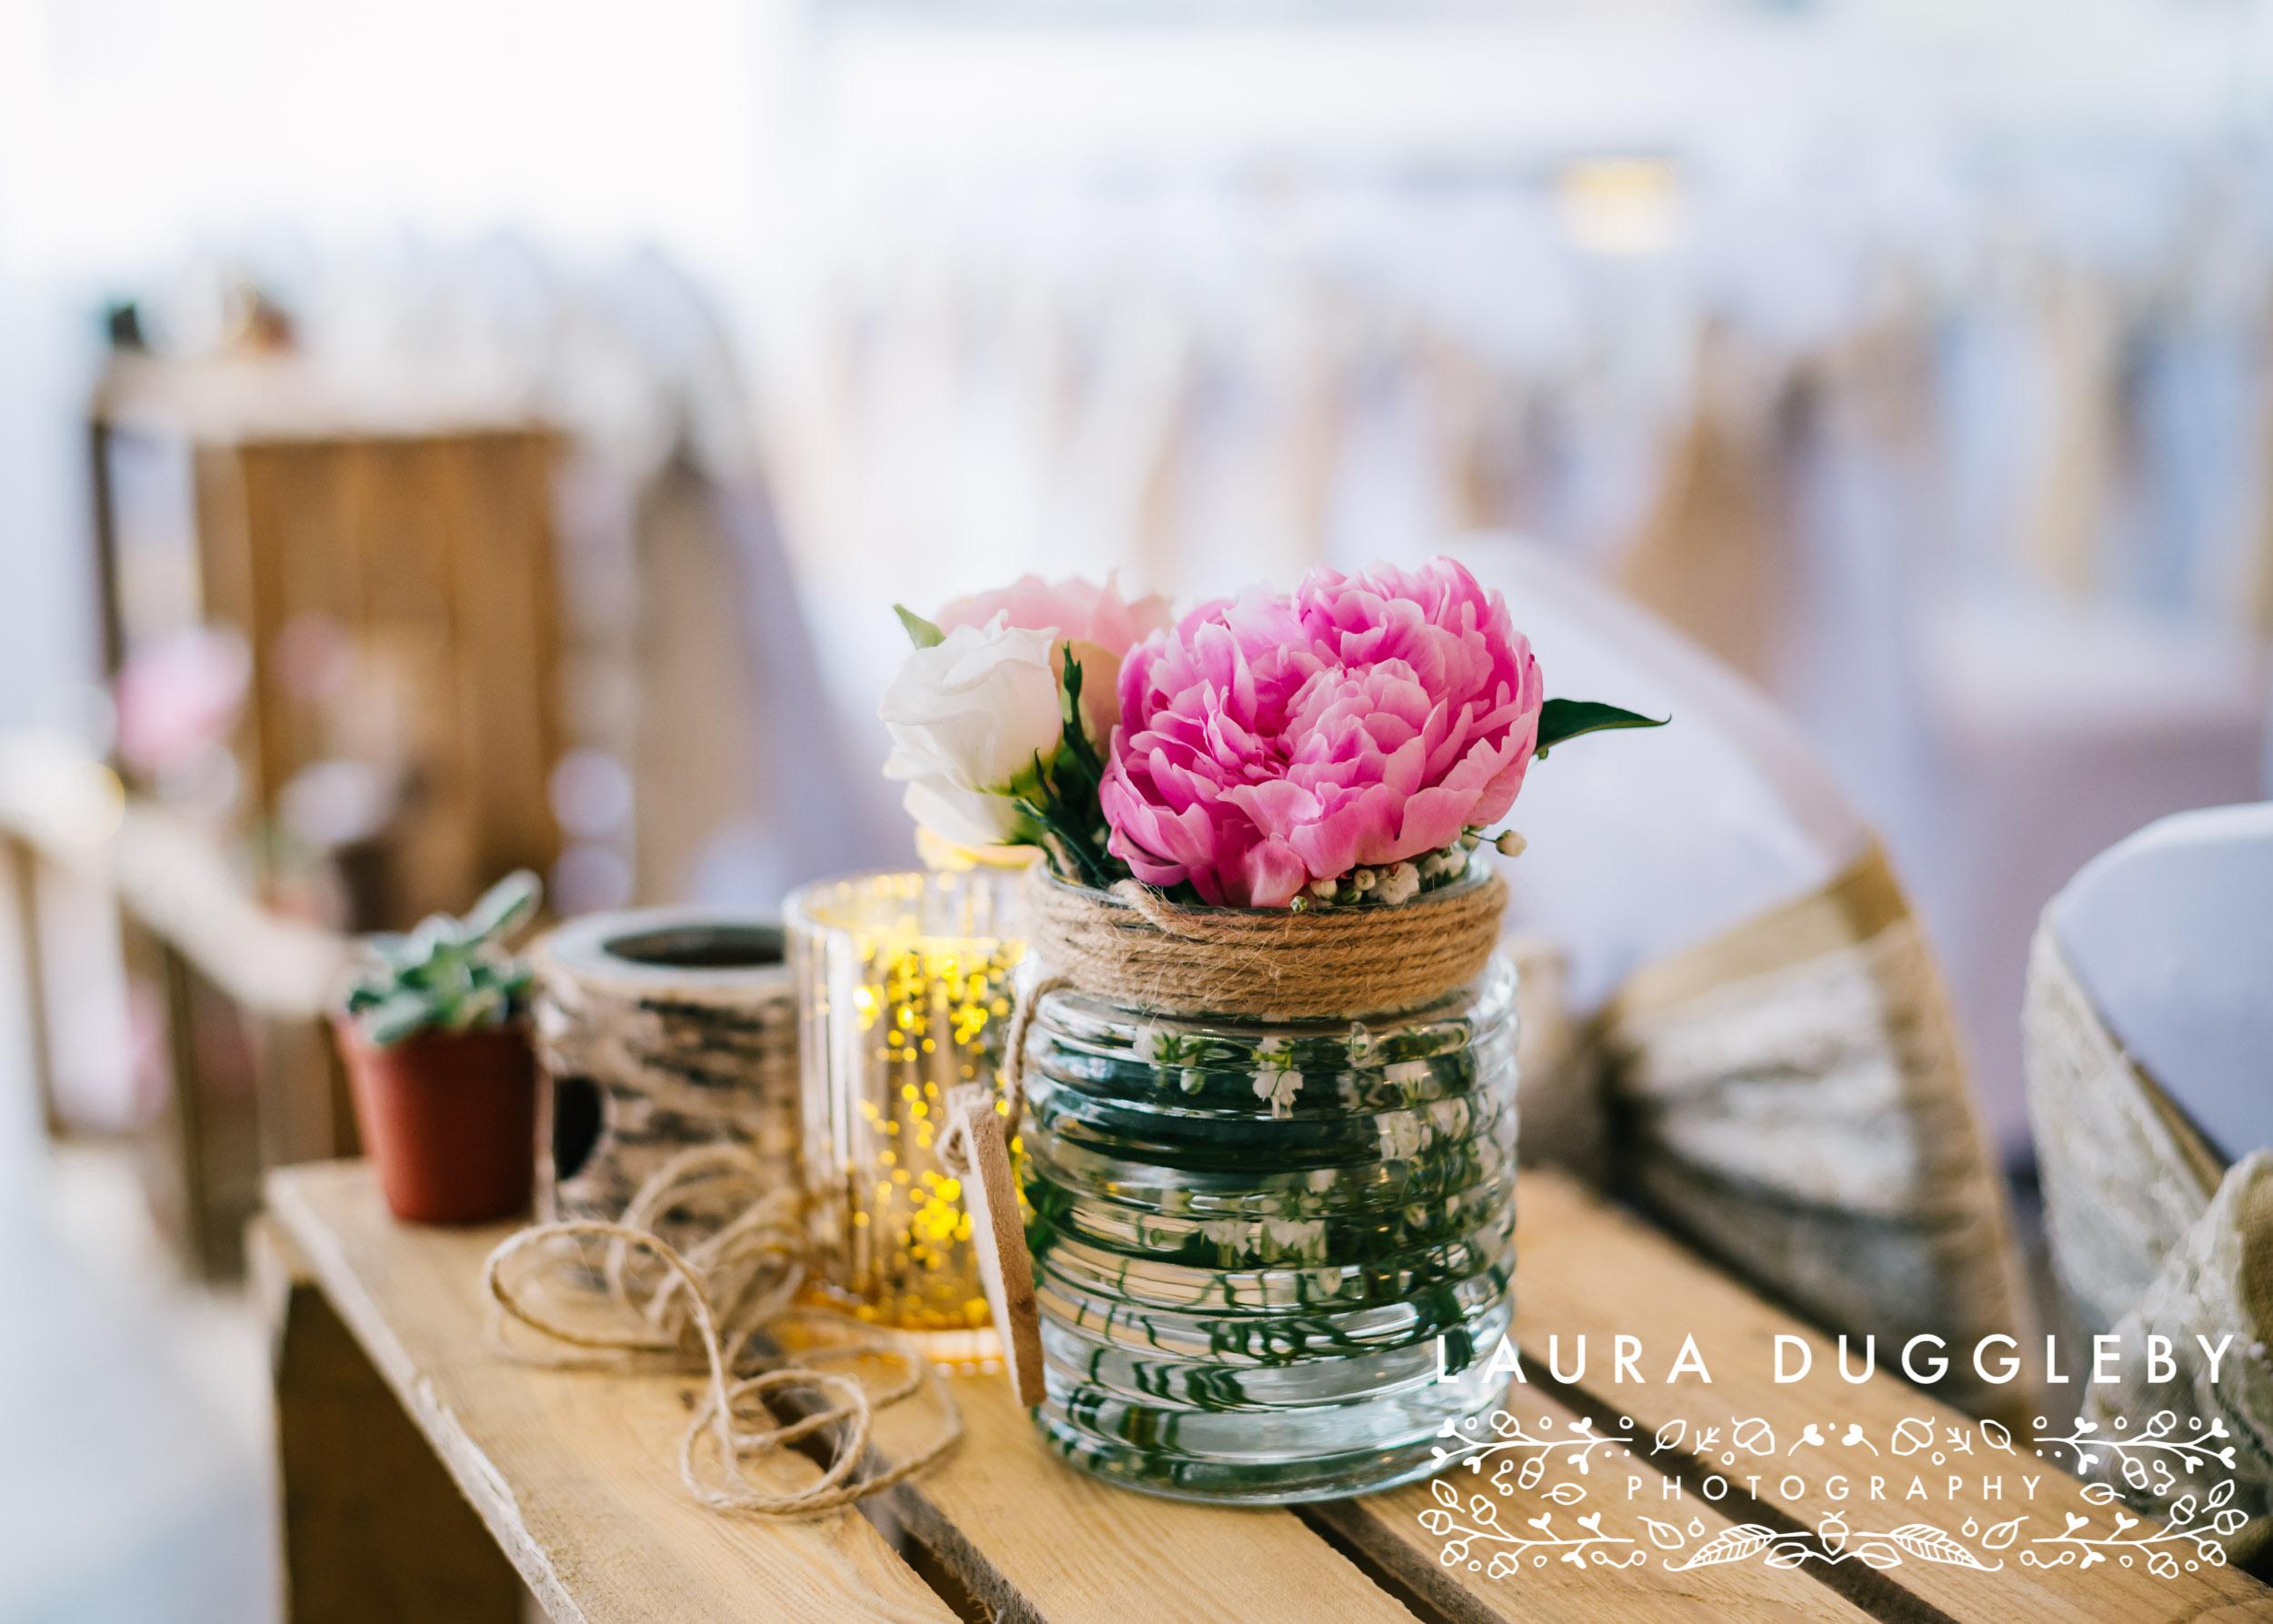 Peaky Blinders Wedding - Whitehall Hotel Darwen - Wedding Photographer7